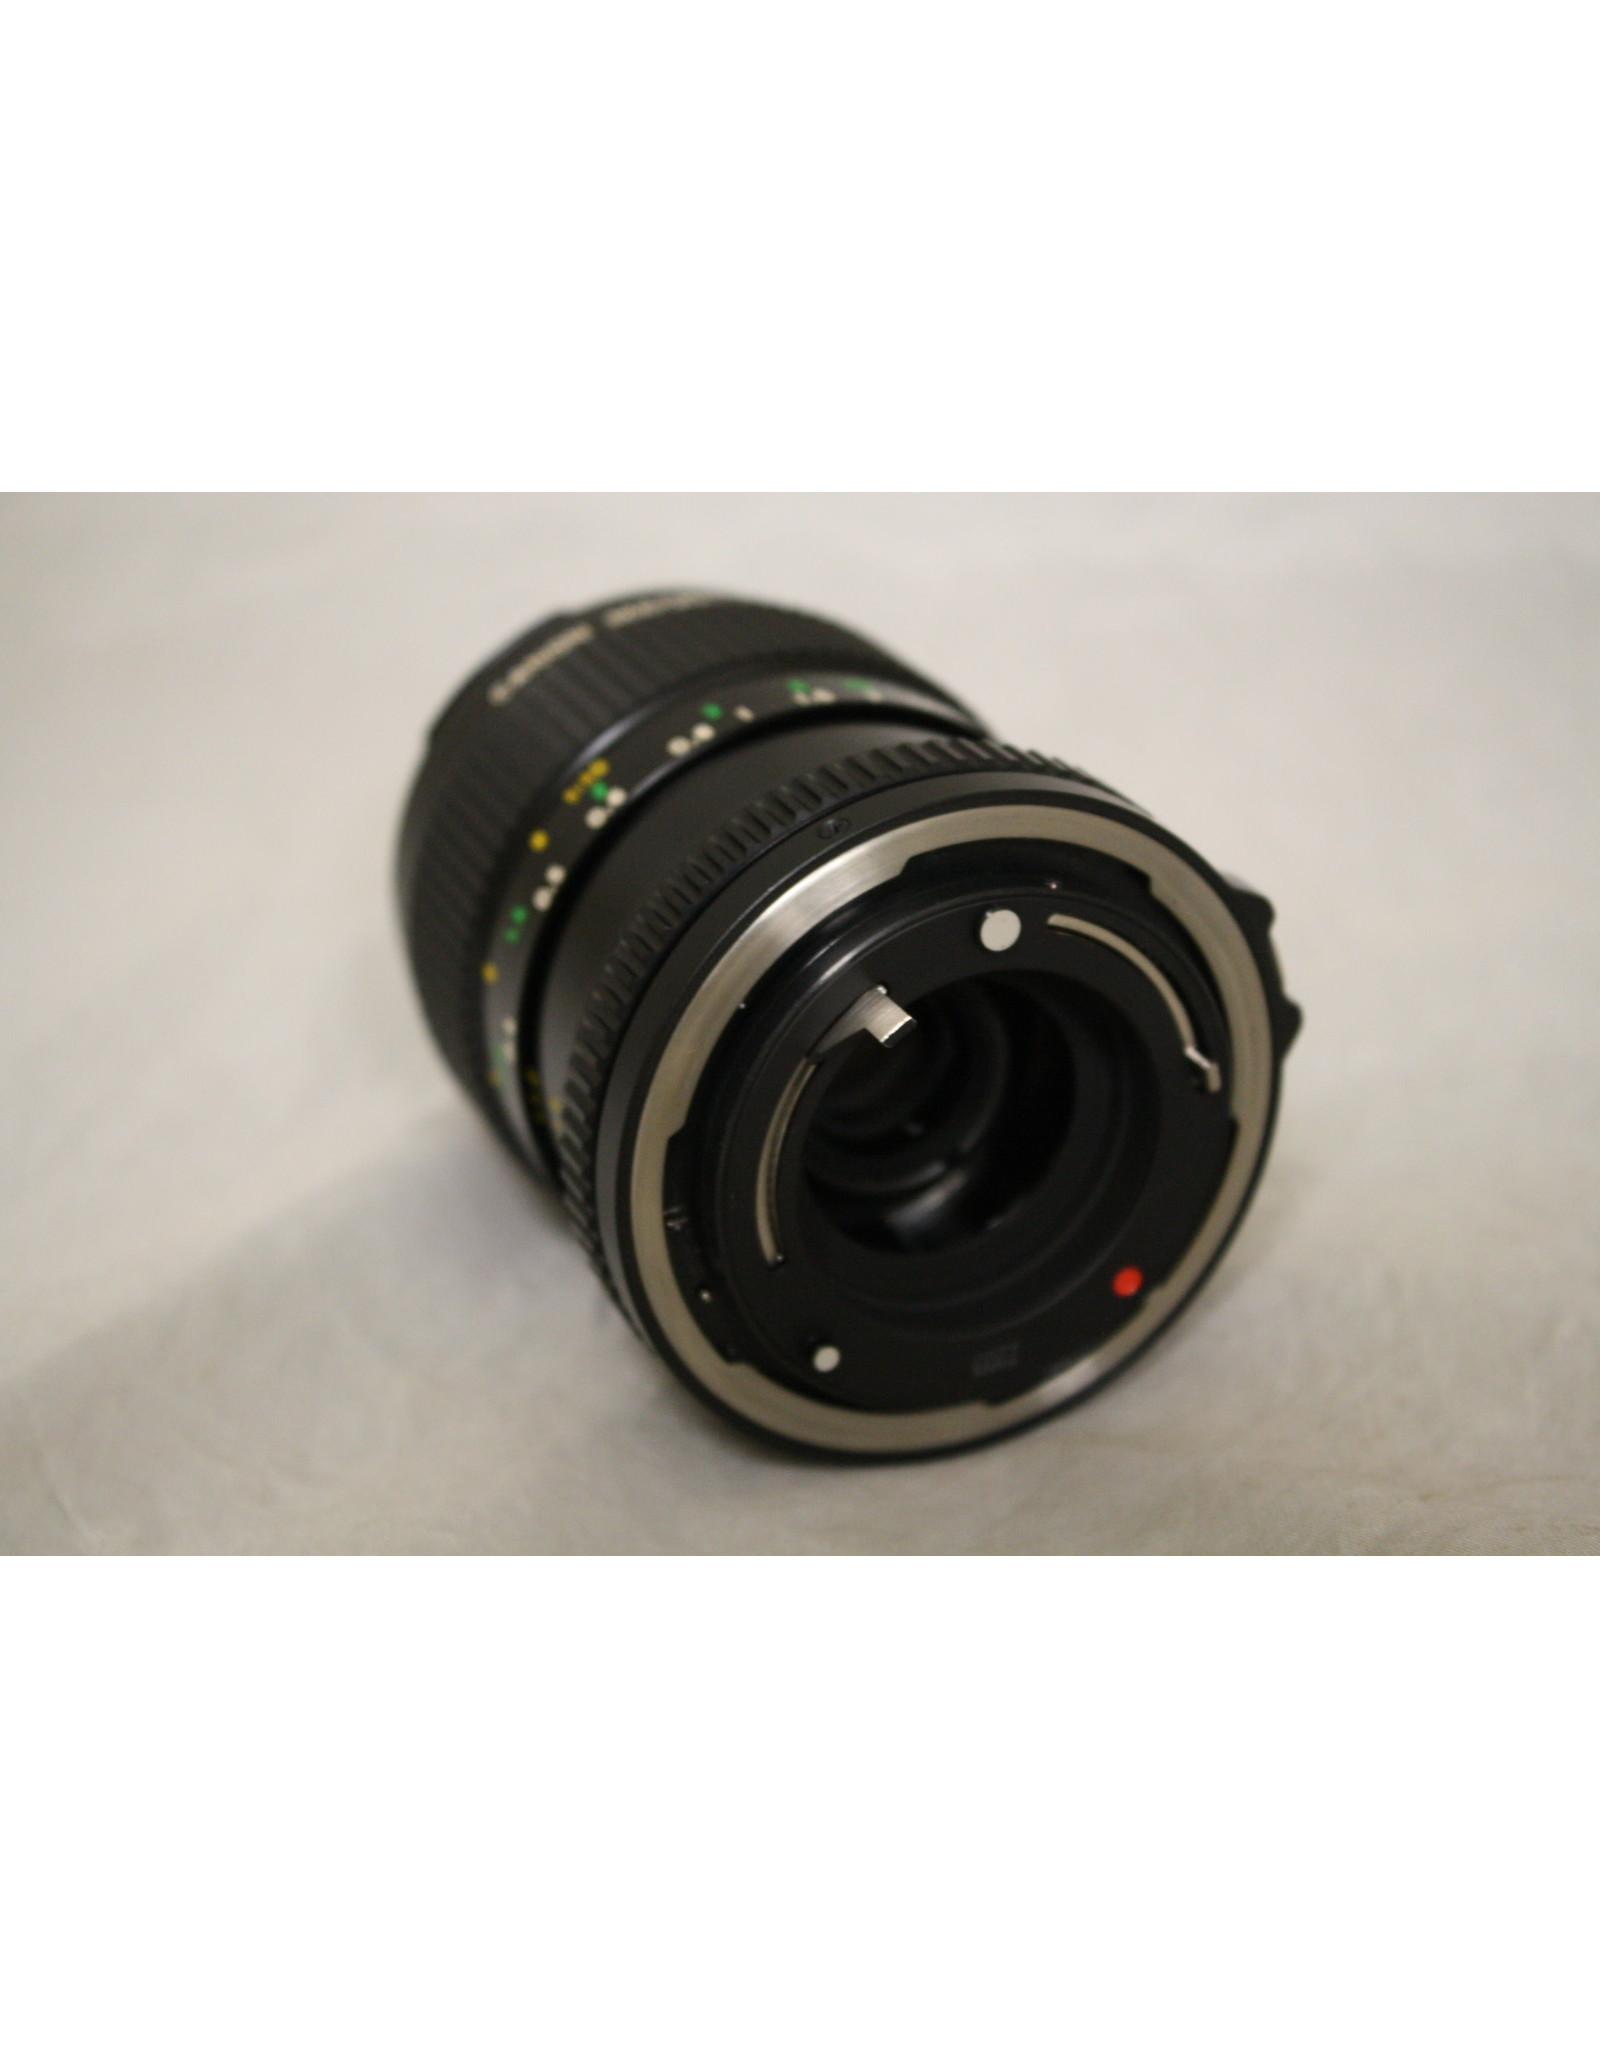 Canon 50mm Macro Lens For 35mm Film Cameras - 1:3.5